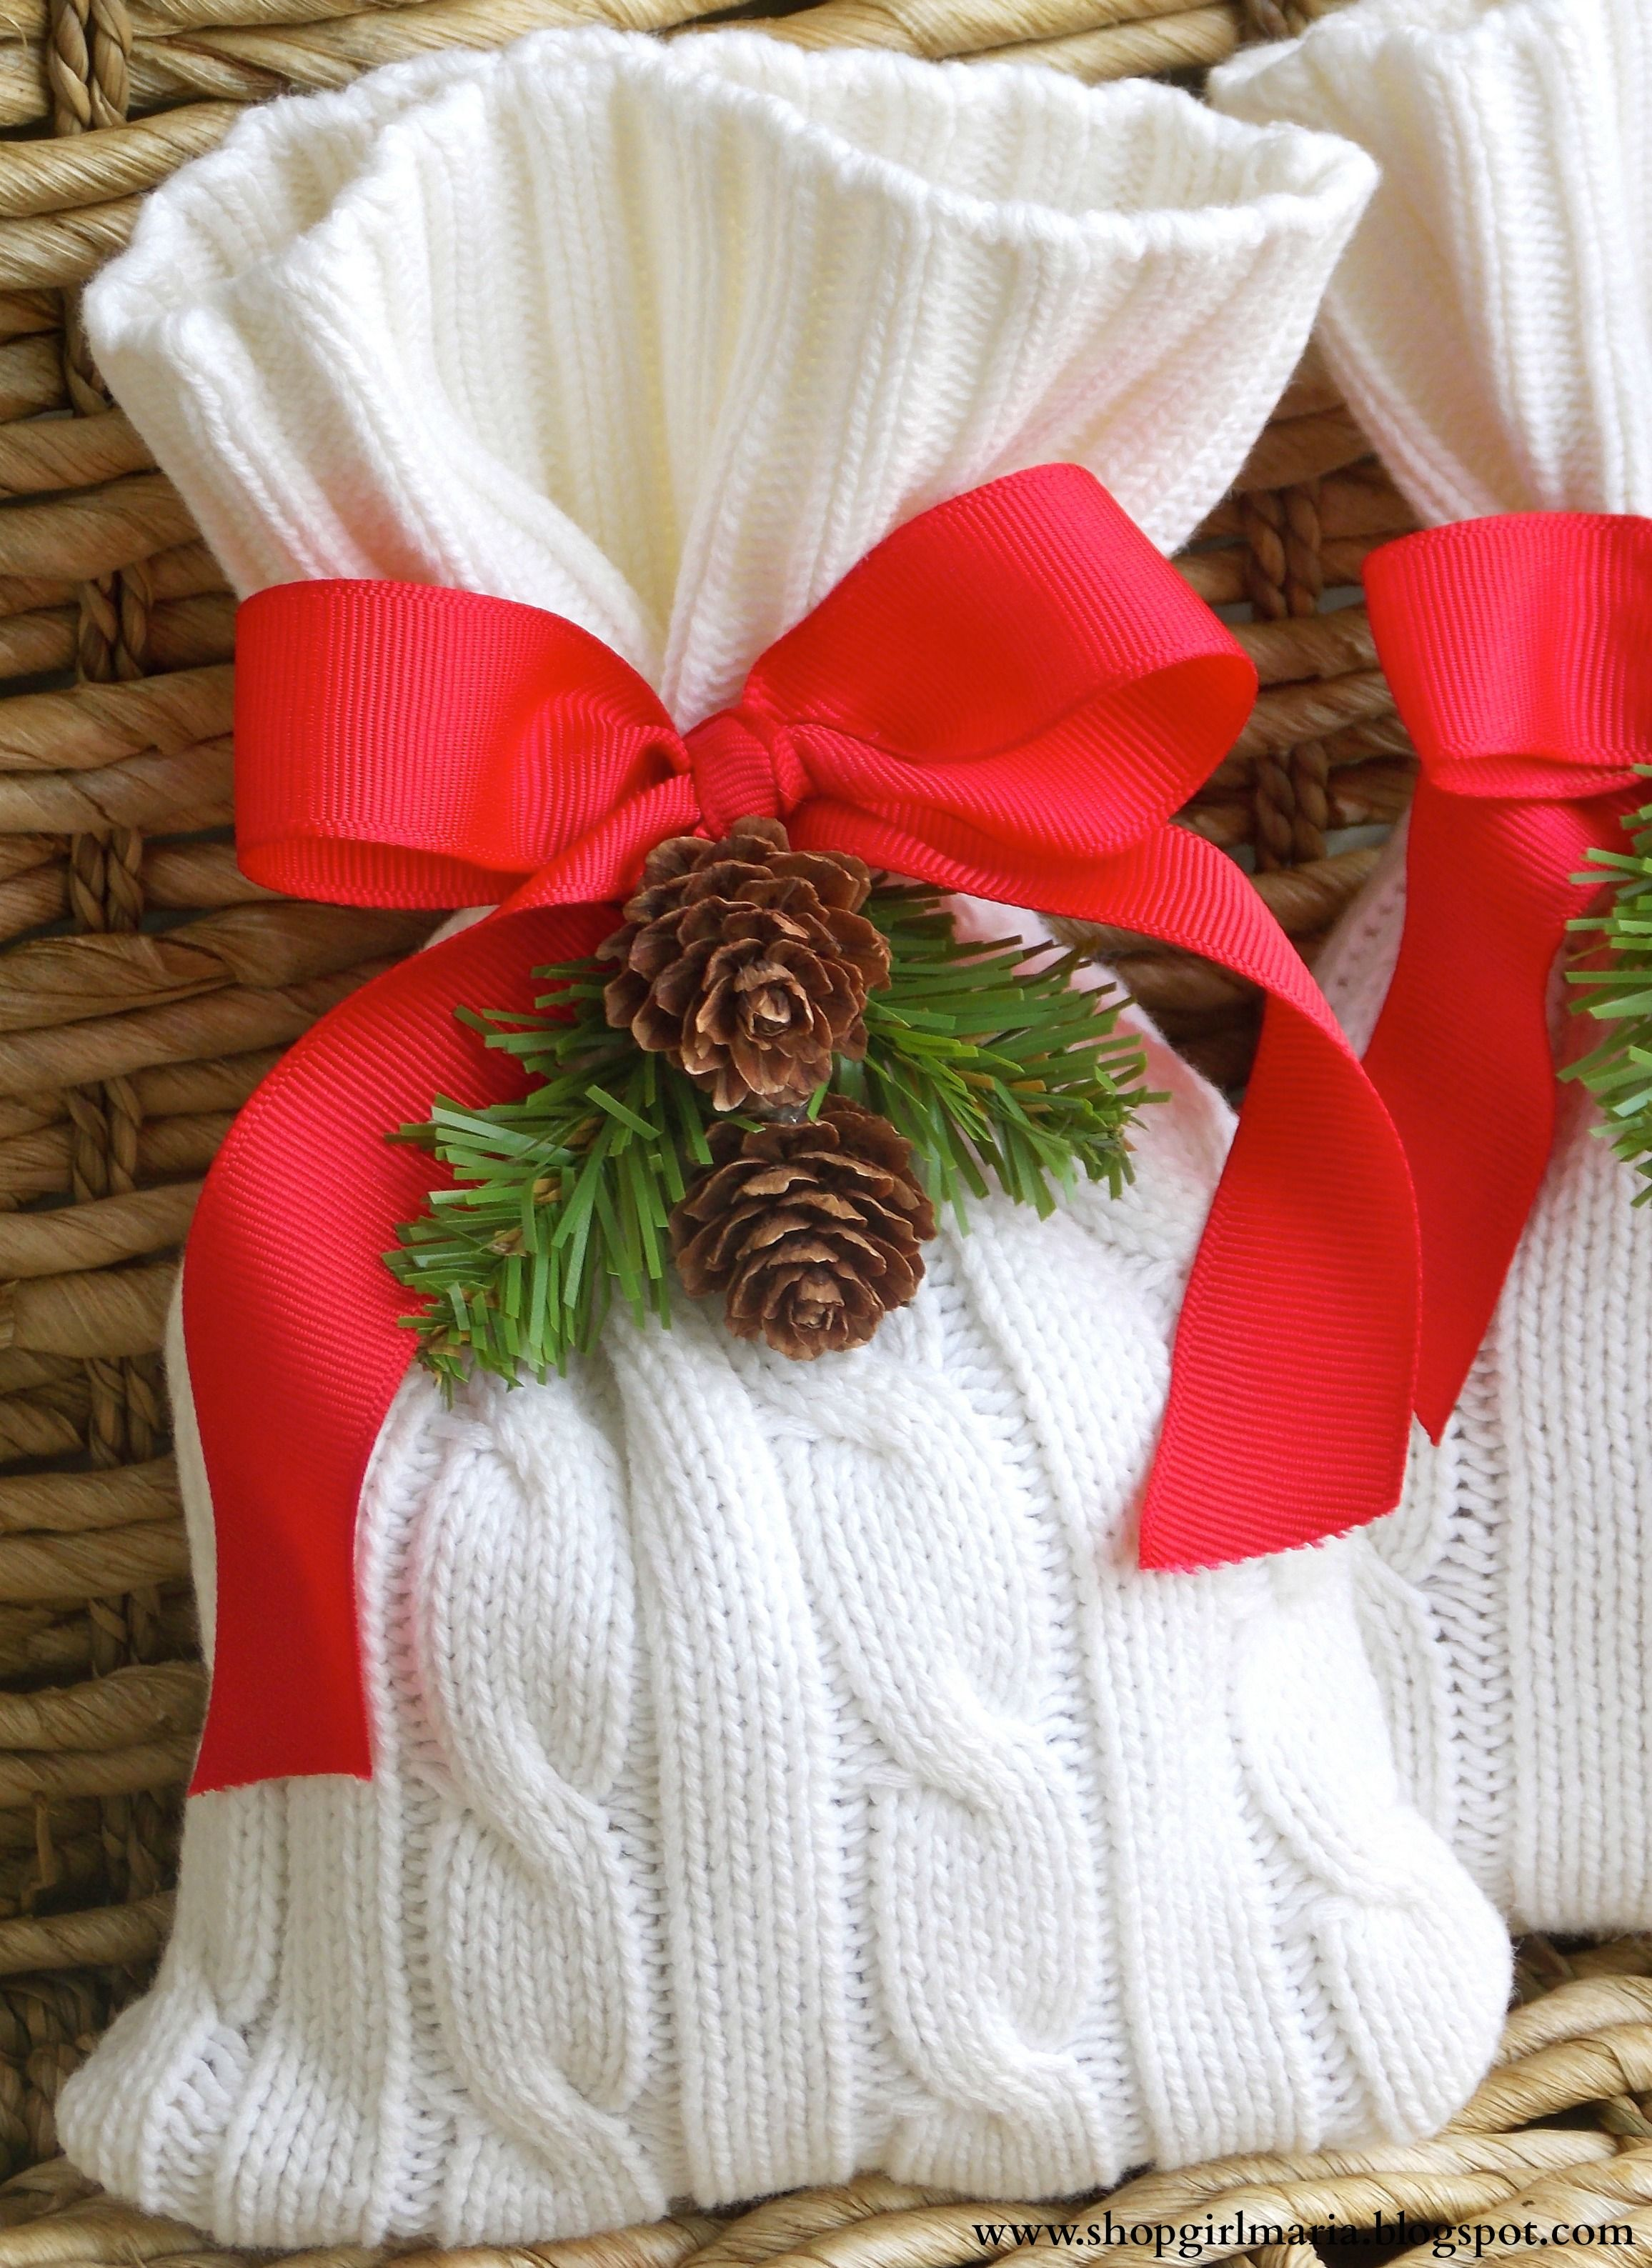 Last minute diy wedding decorations  Christmas Treat Bags  present u knit  Pinterest  Christmas treat